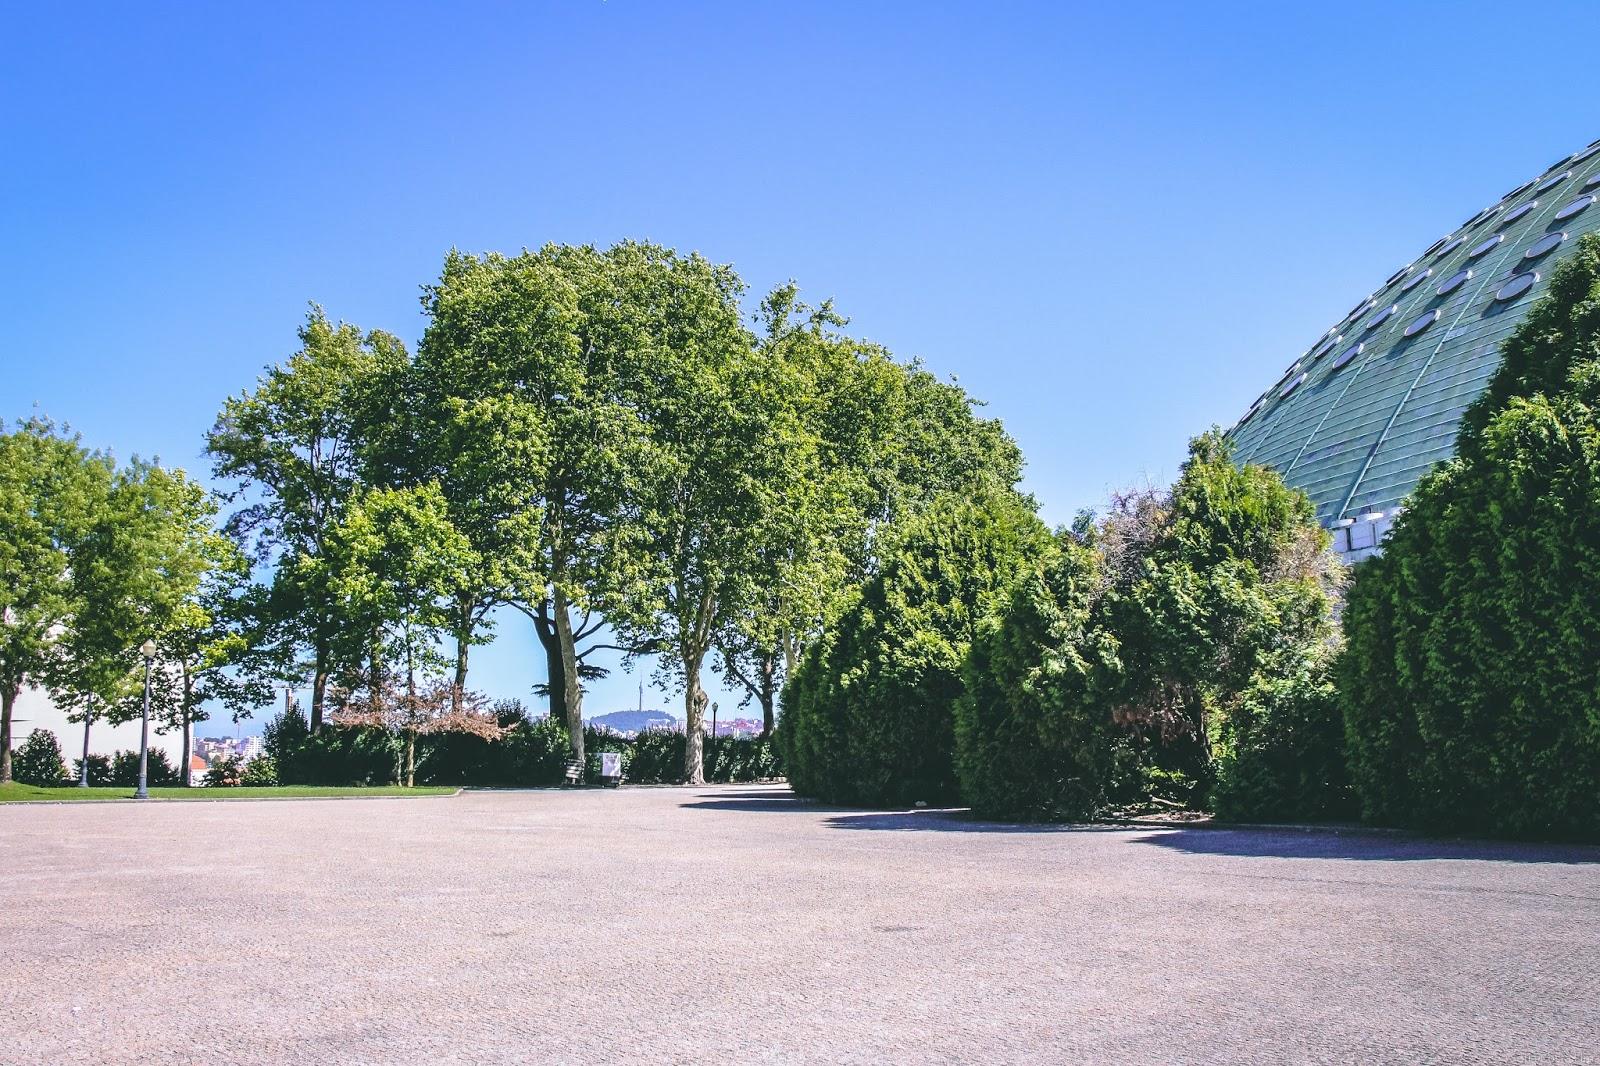 Palácio de Cristal - Porto